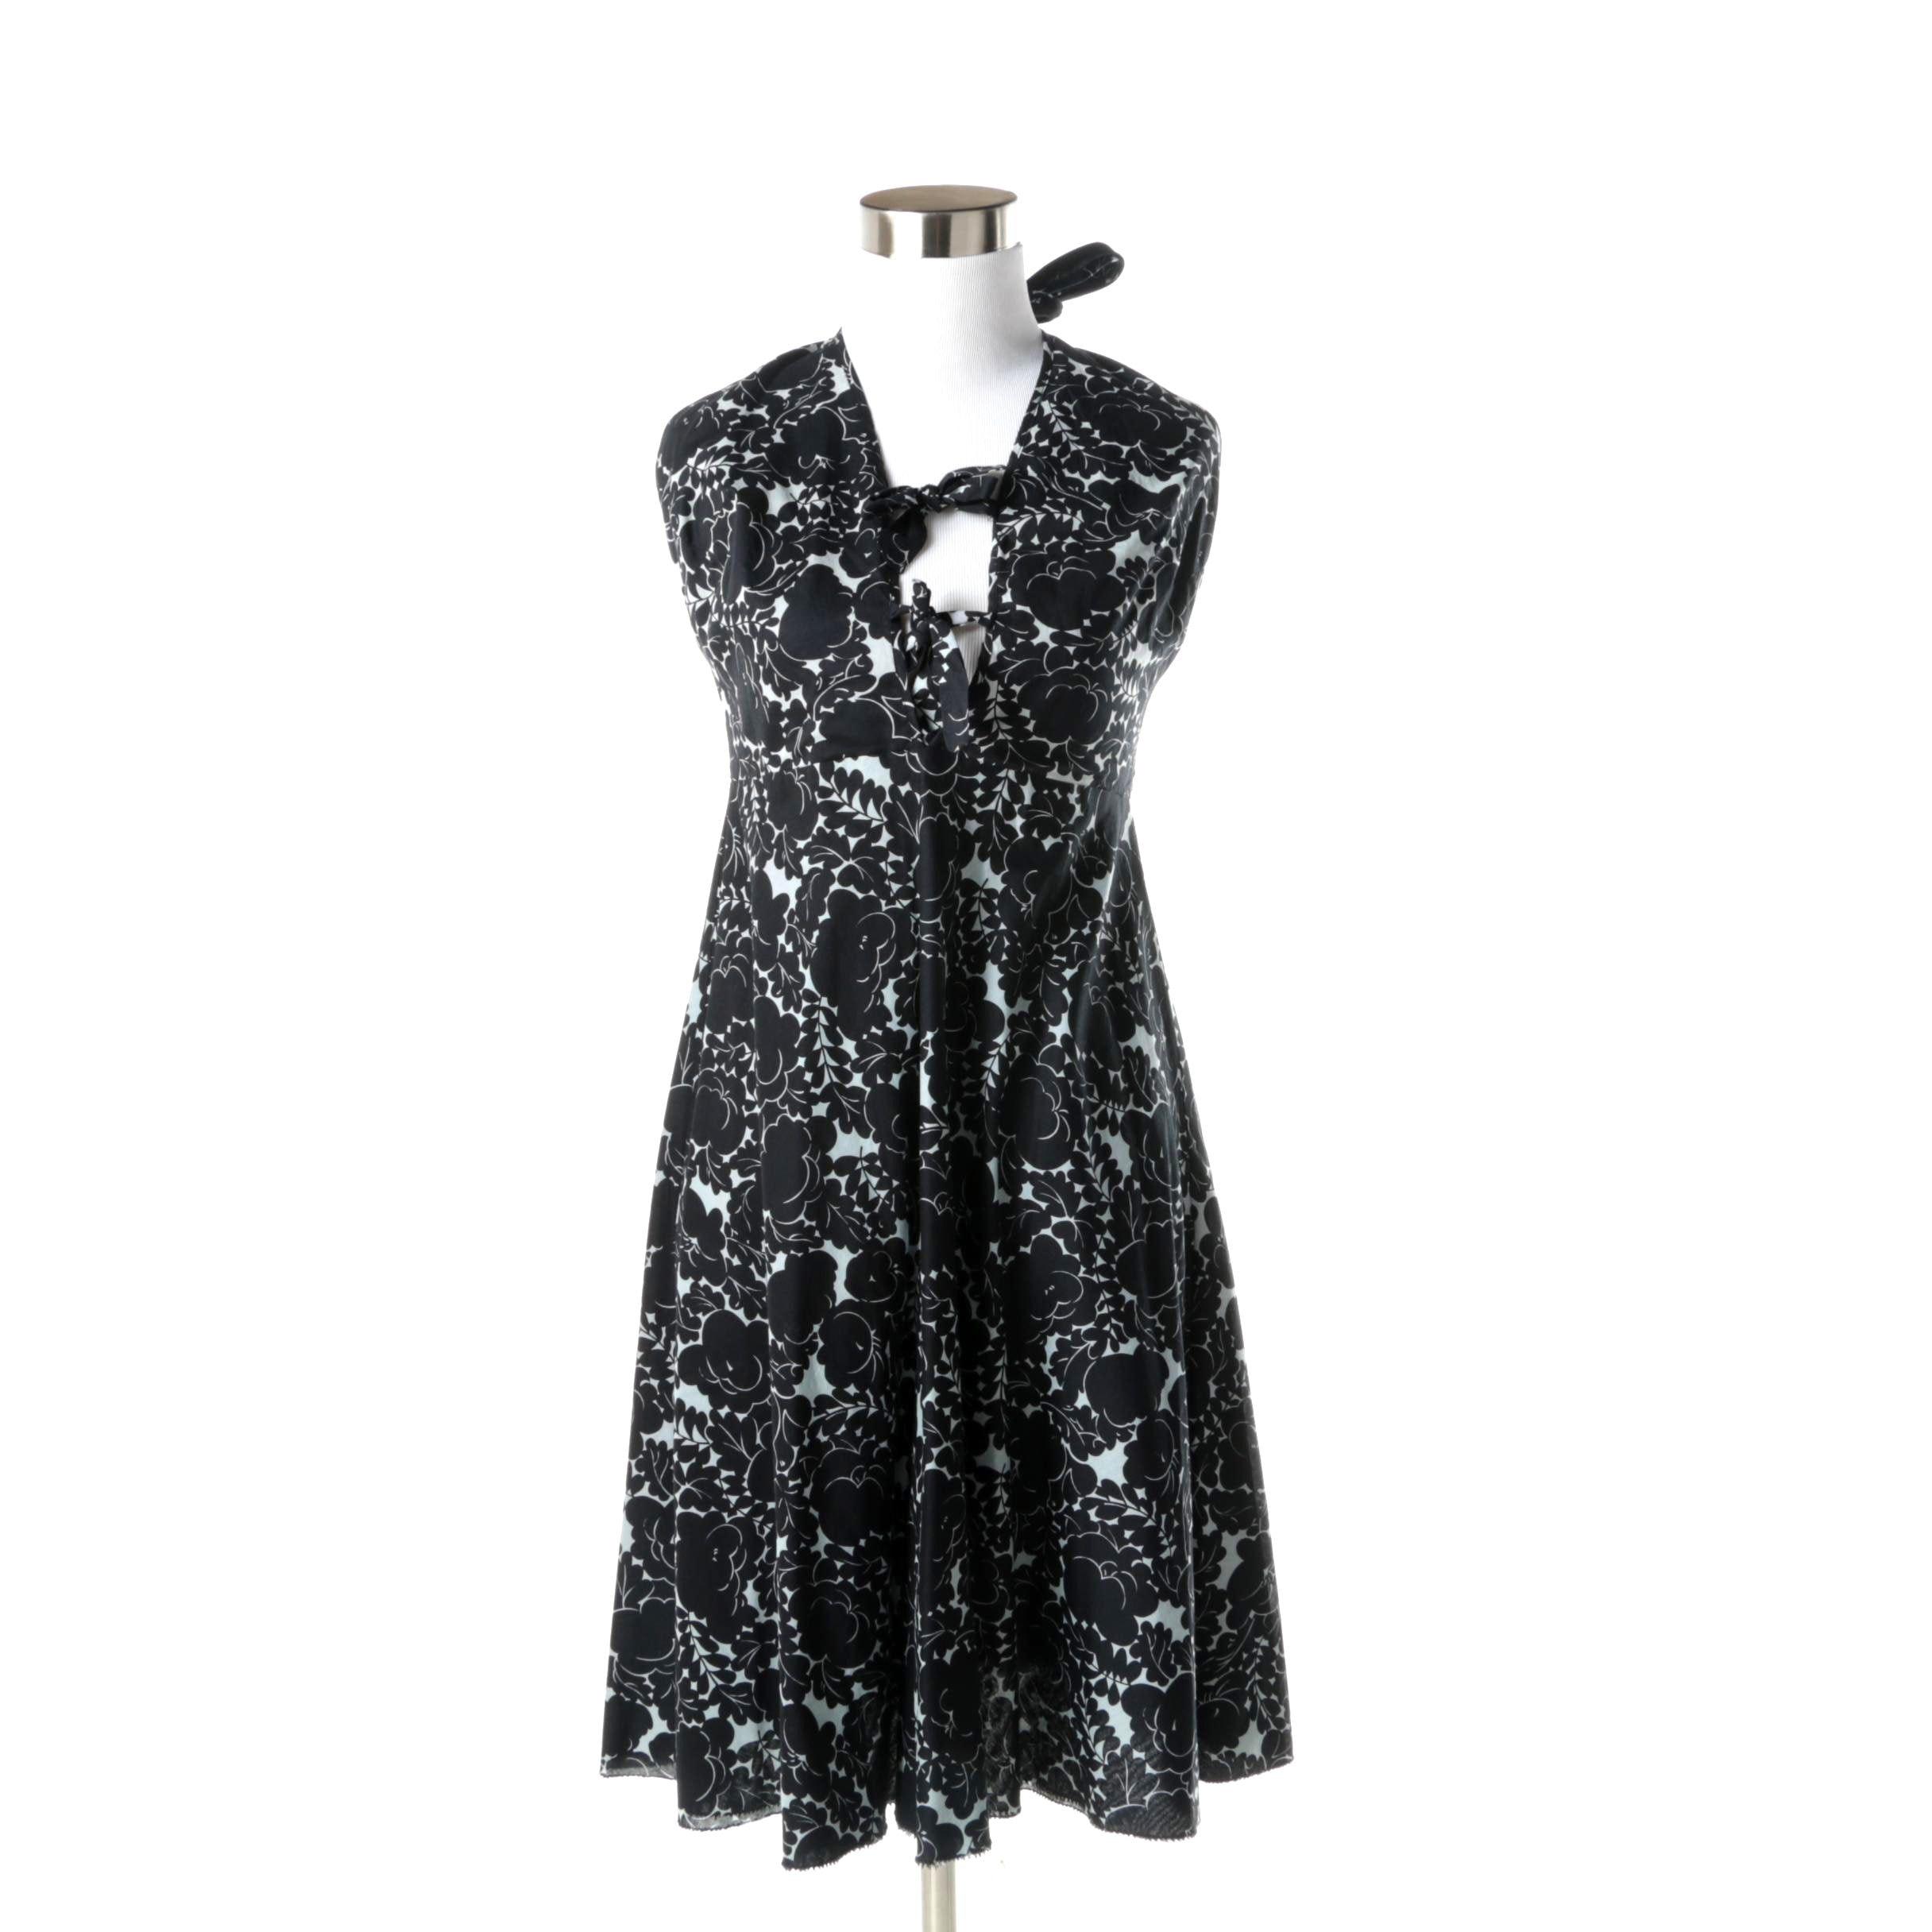 Nicole Miller Black and White Halter Dress